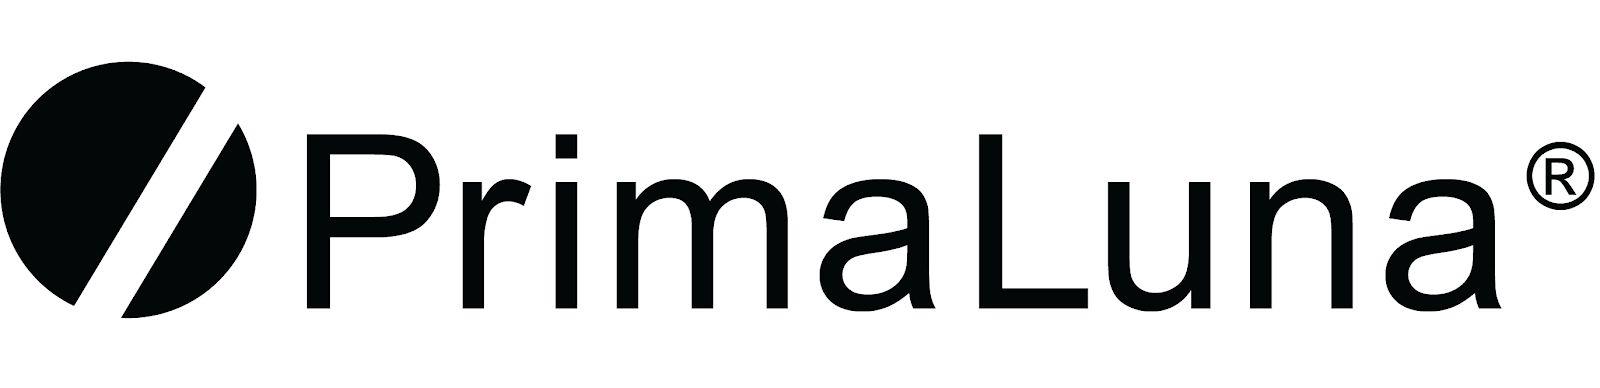 https://scowcroftandassociates.com/wp-content/uploads/2019/09/PrimaLuna-Logo.jpg